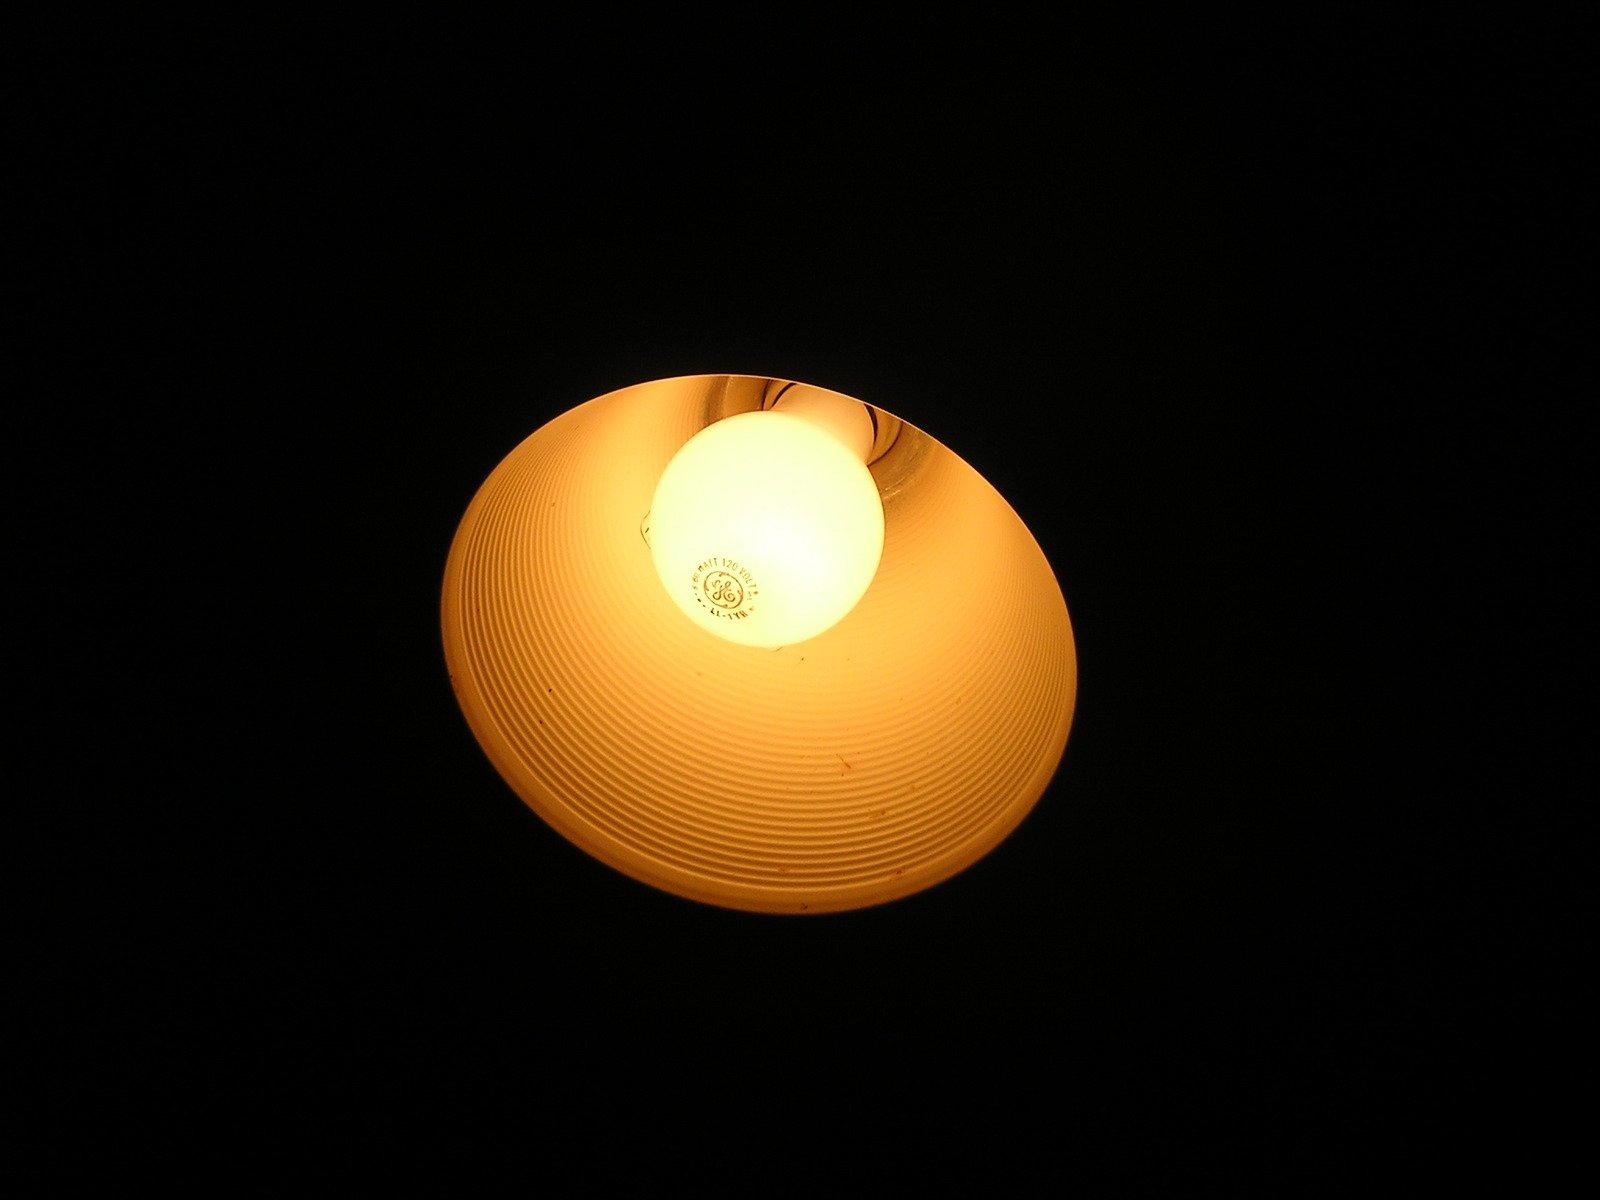 žiarovka, lampa